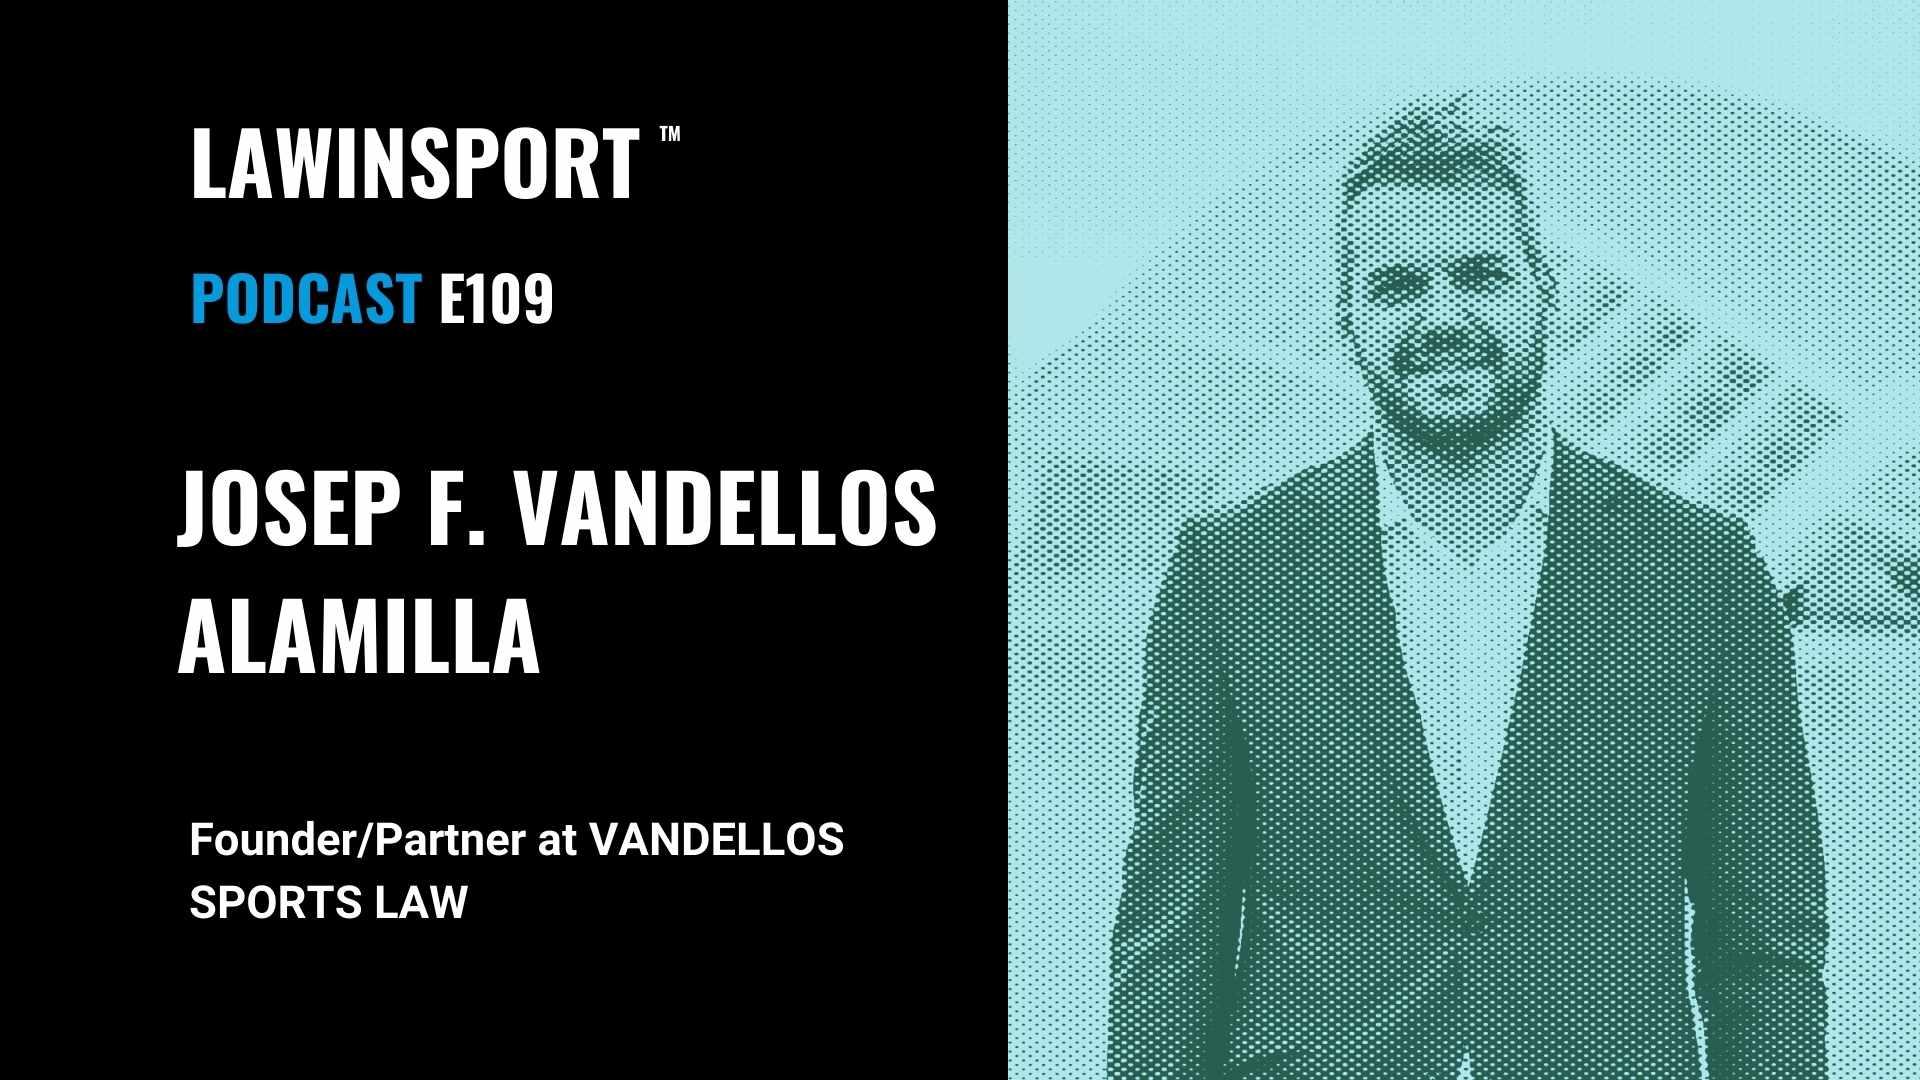 Josep F. Vandellos Alamilla, Founder/Partner at VANDELLOS SPORTS LAW - E109